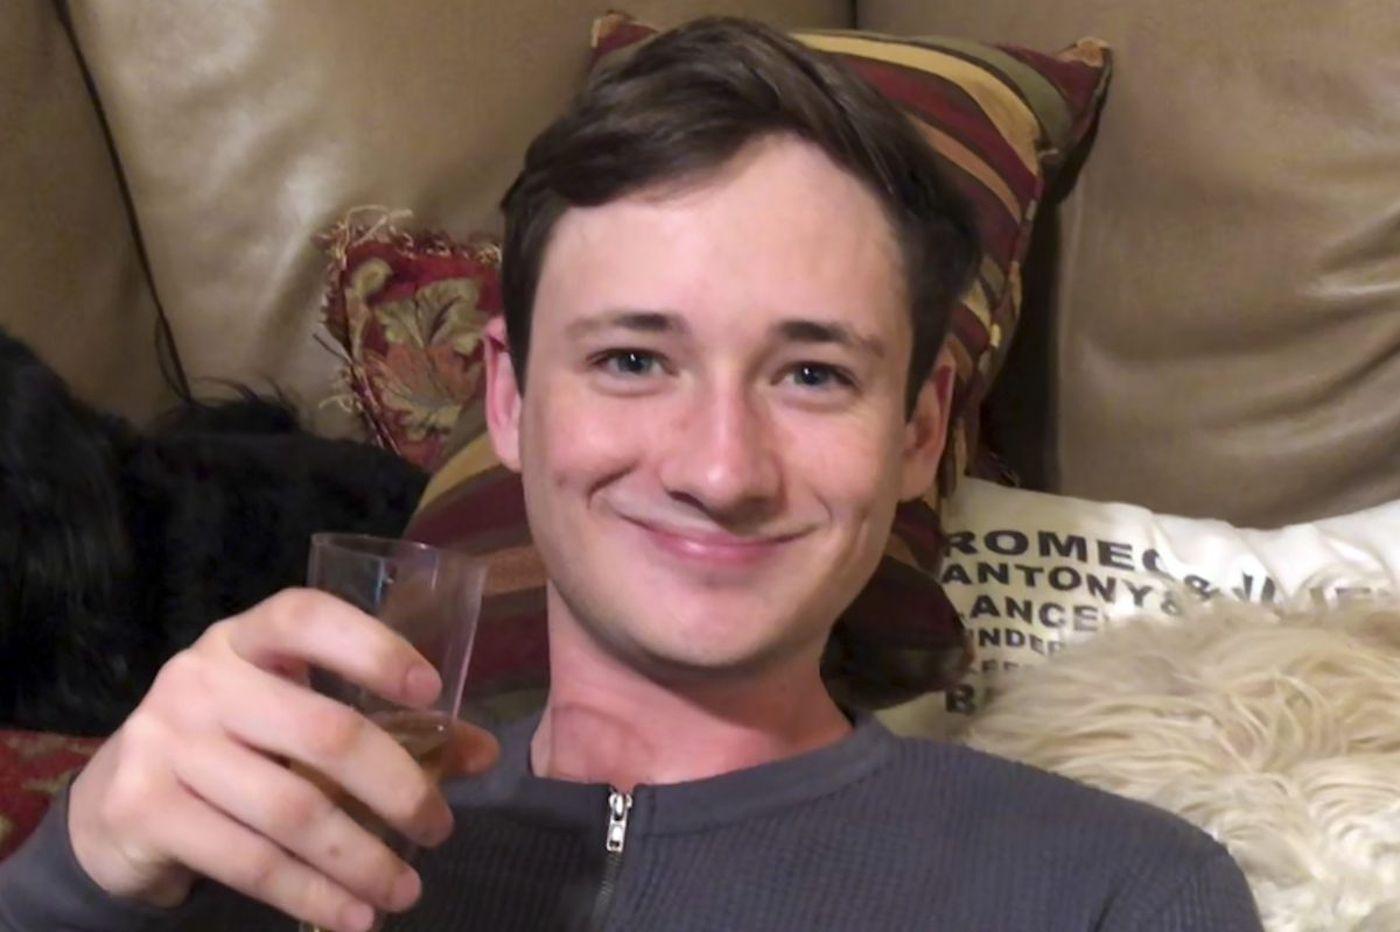 High school friend held in slaying of Penn student in California